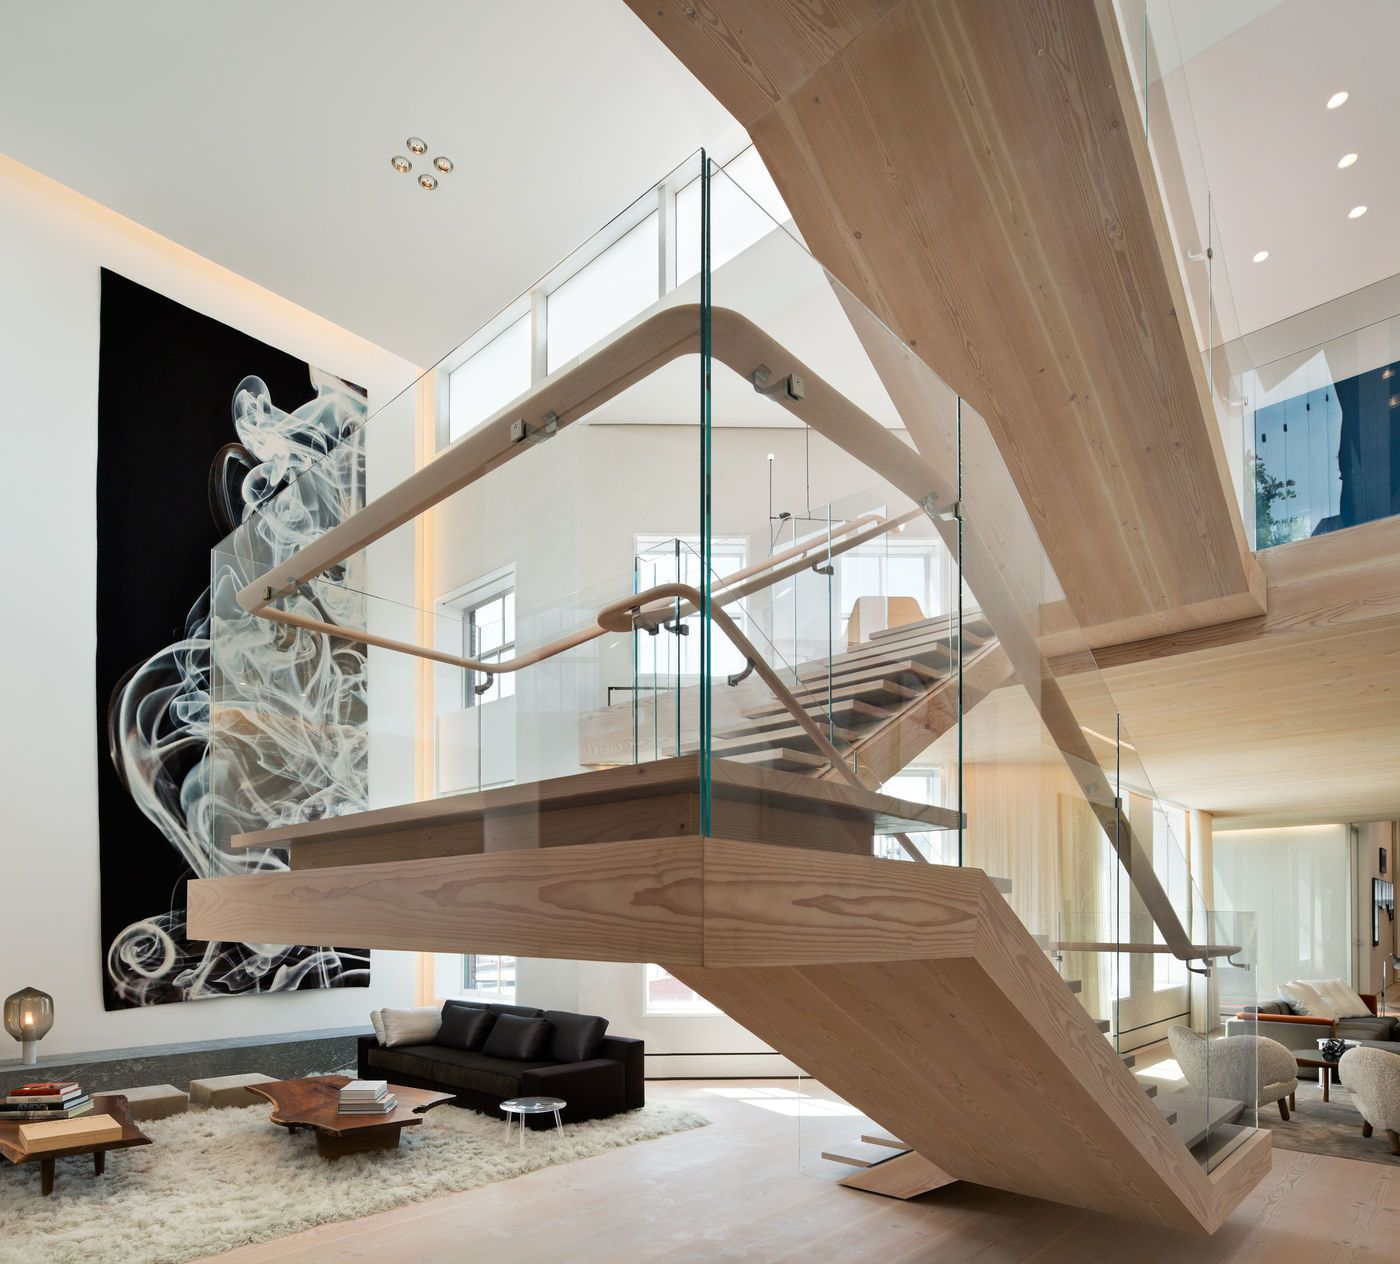 Soho Loft   Gabellini Sheppard   Stairs & Railings   Pinterest